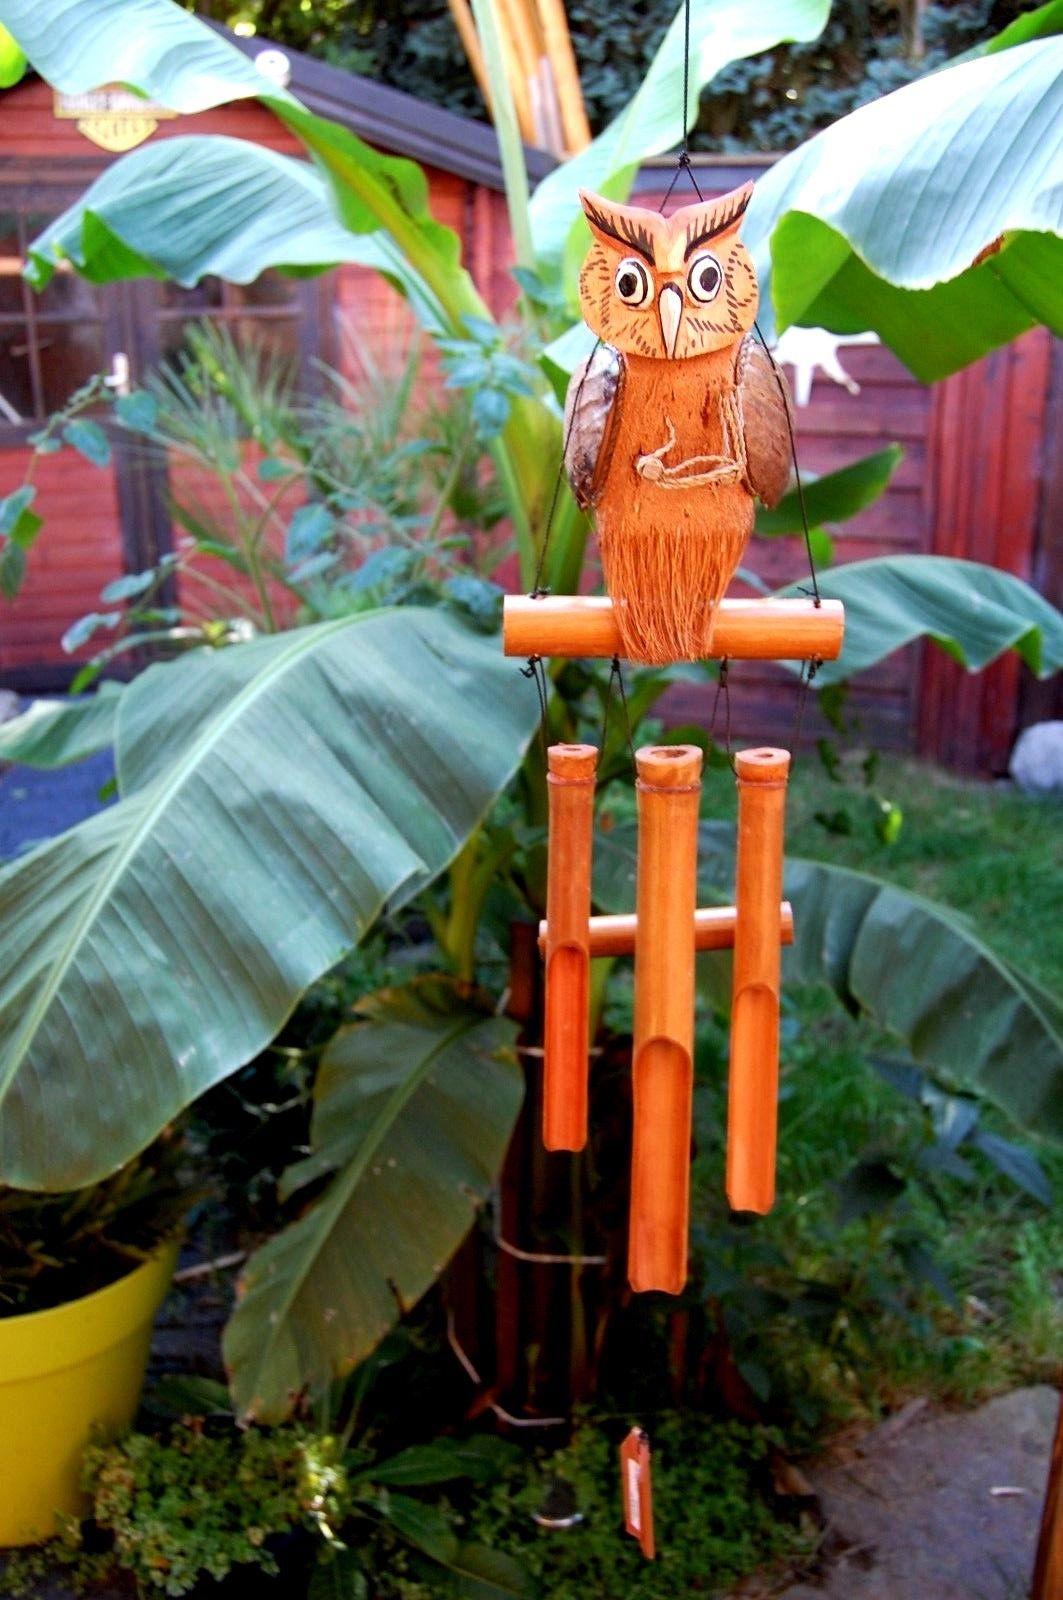 WINDSPIEL TWISTER BUNT Klangspiel Bambuswindspiel Eule 20 x 95 cm